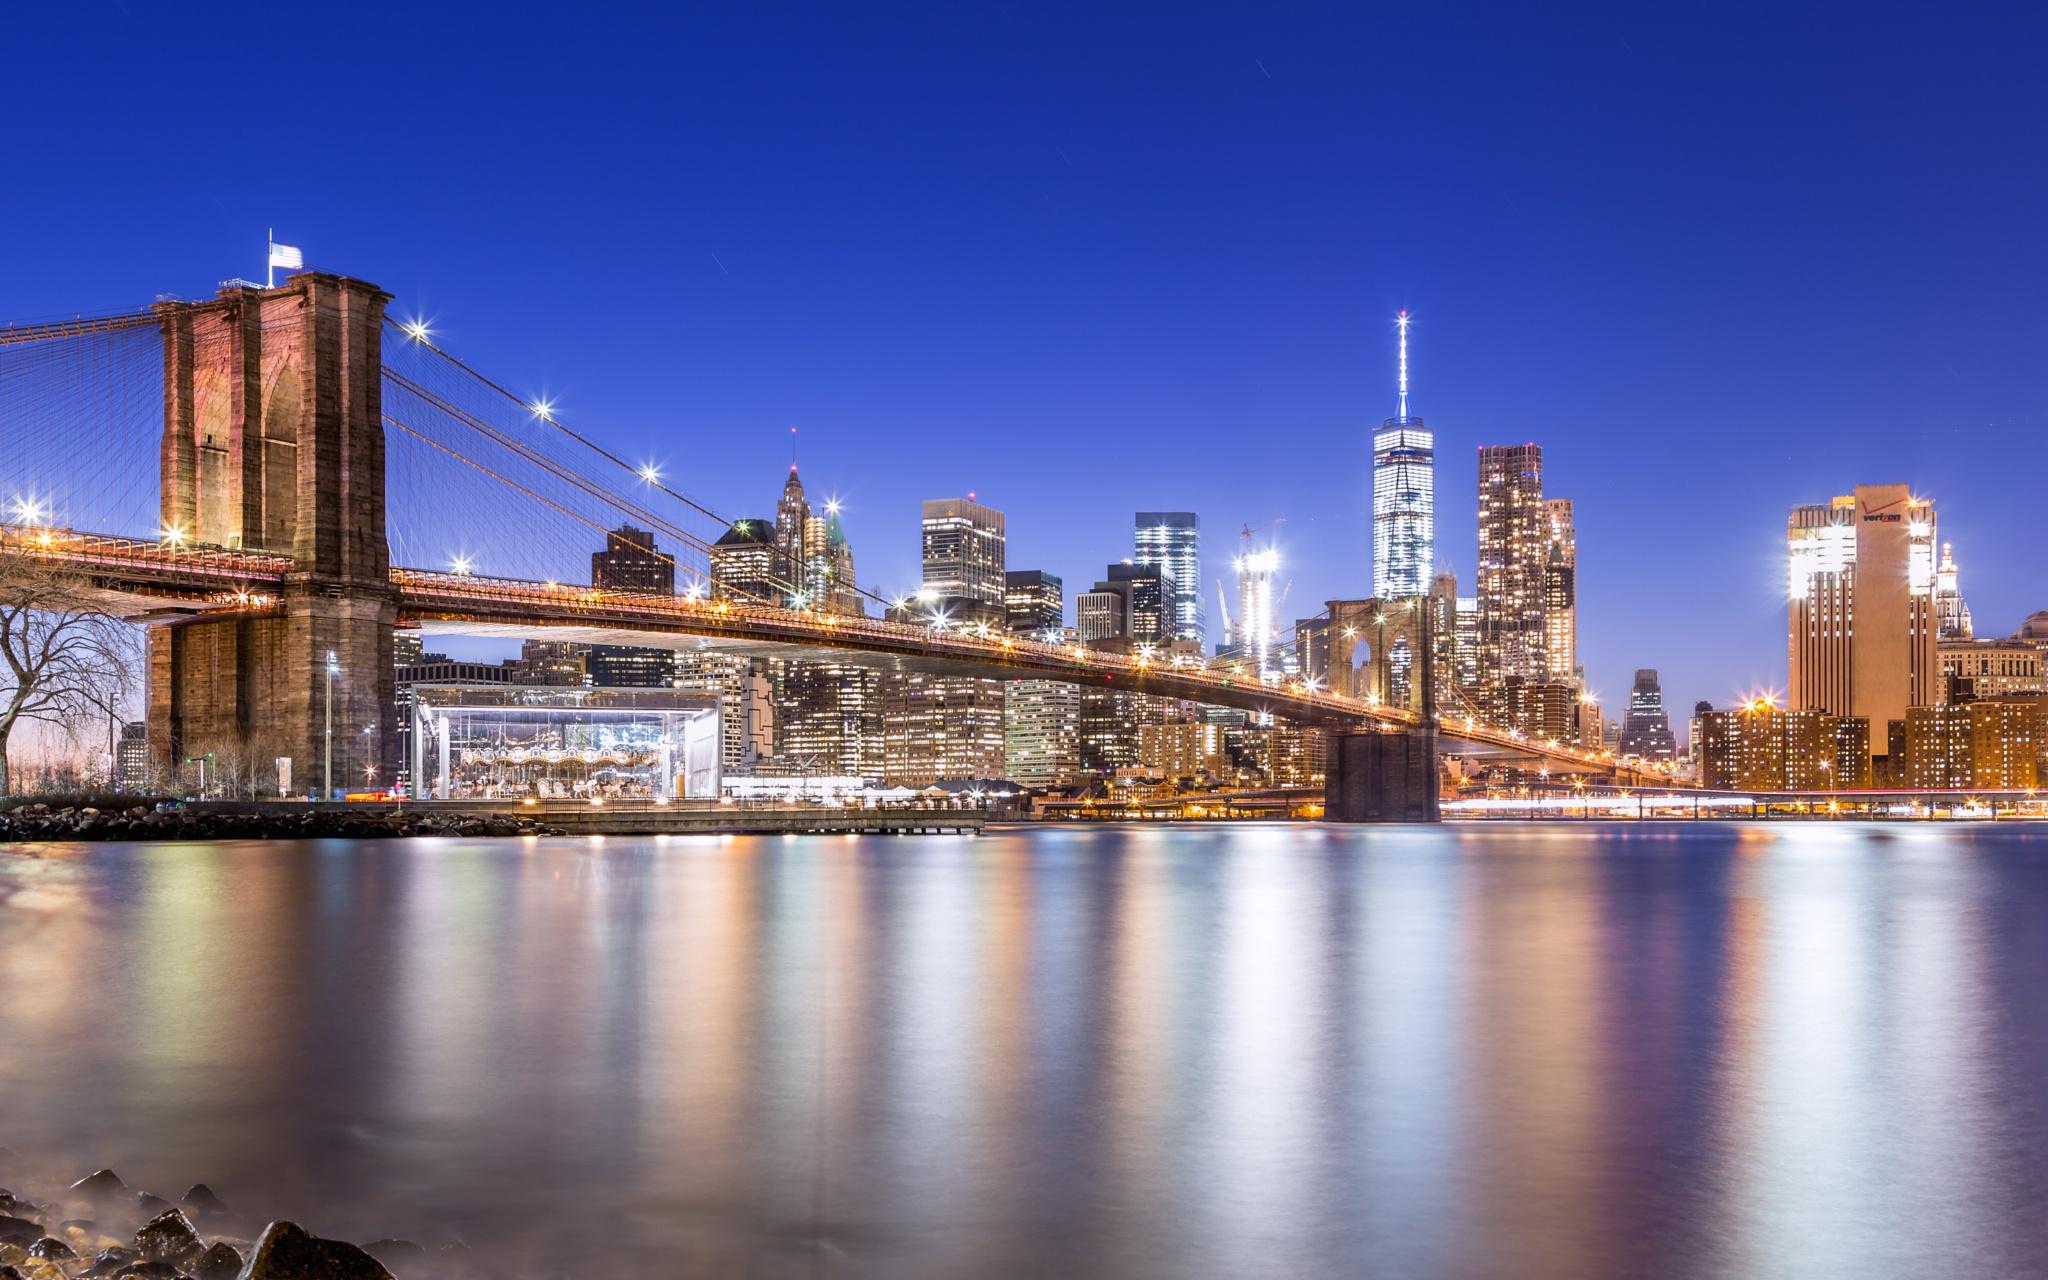 Brooklyn Bridge by Hameed S